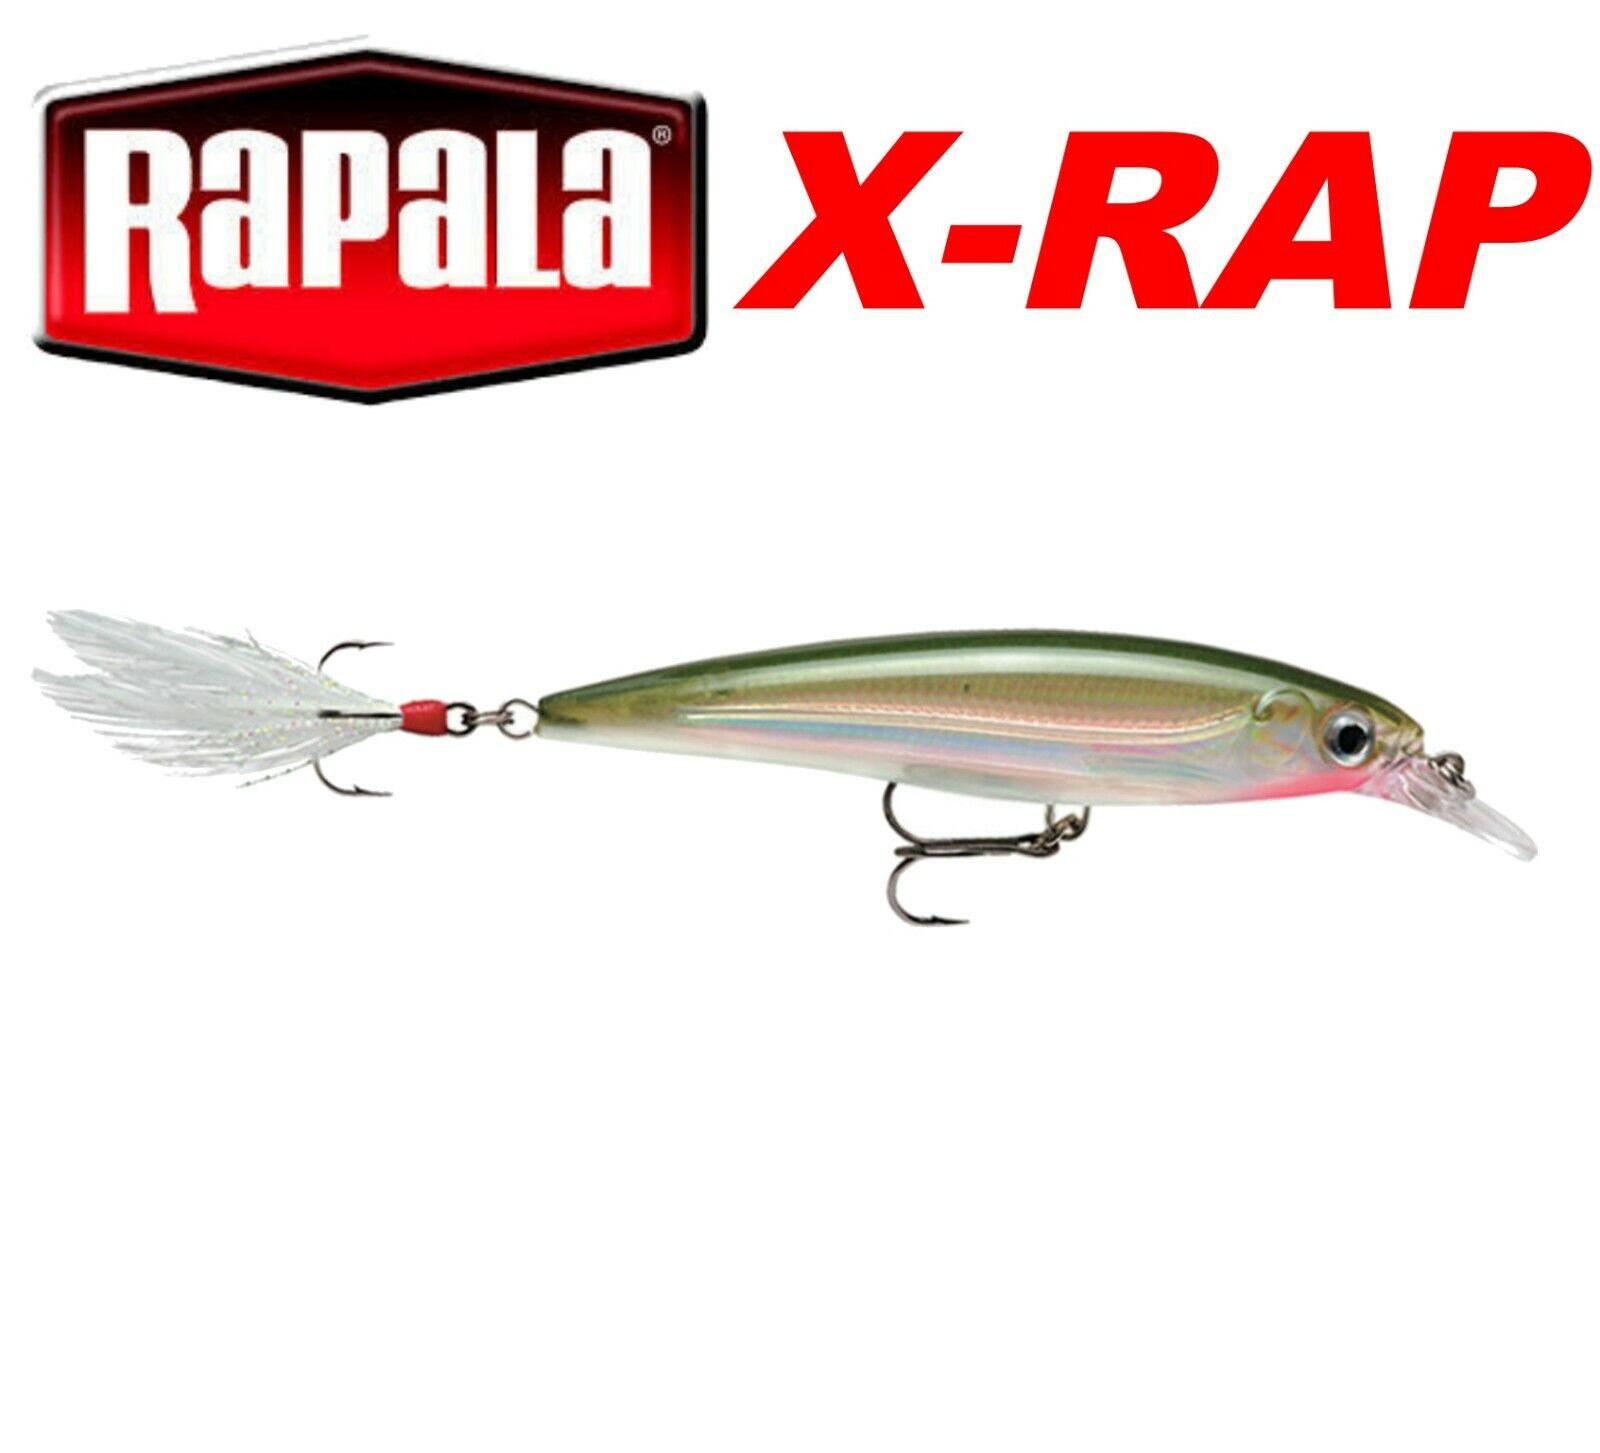 Rapala X-RAP Fishing Lures 8cm 10cm Predator Fishing Tackle Sea Pike Bass Perch